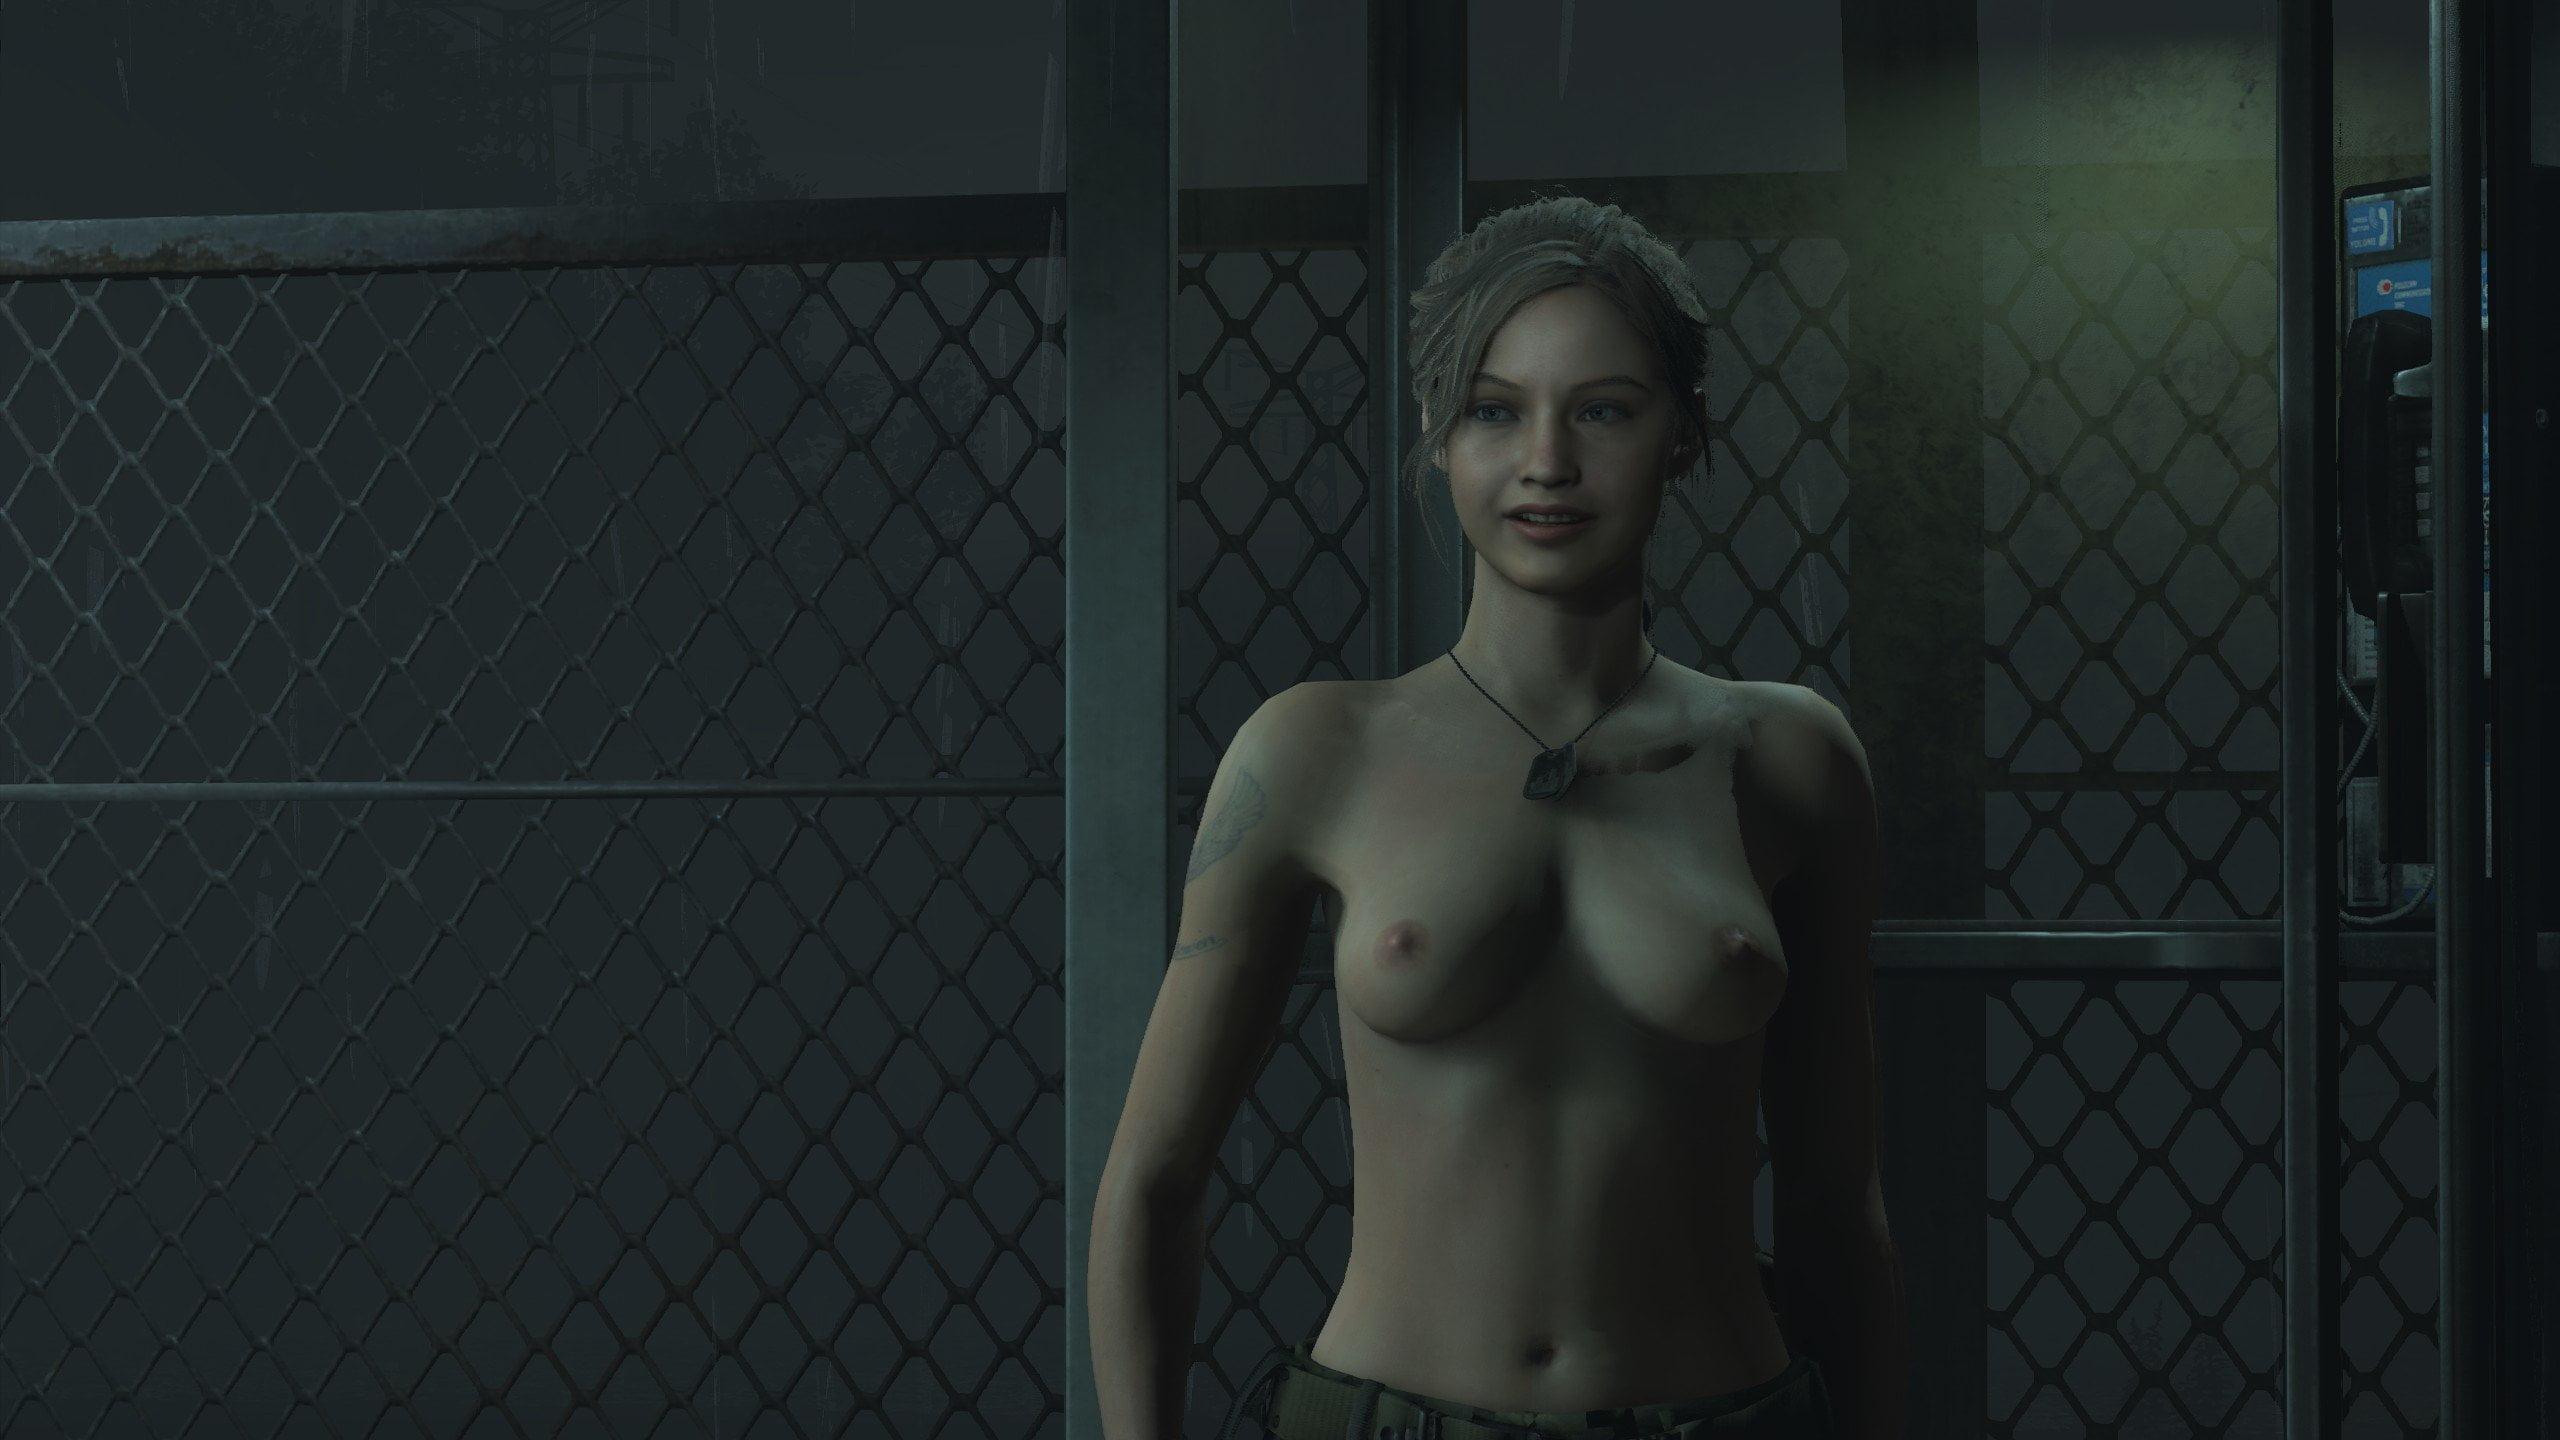 Resident evil 5 nude mod